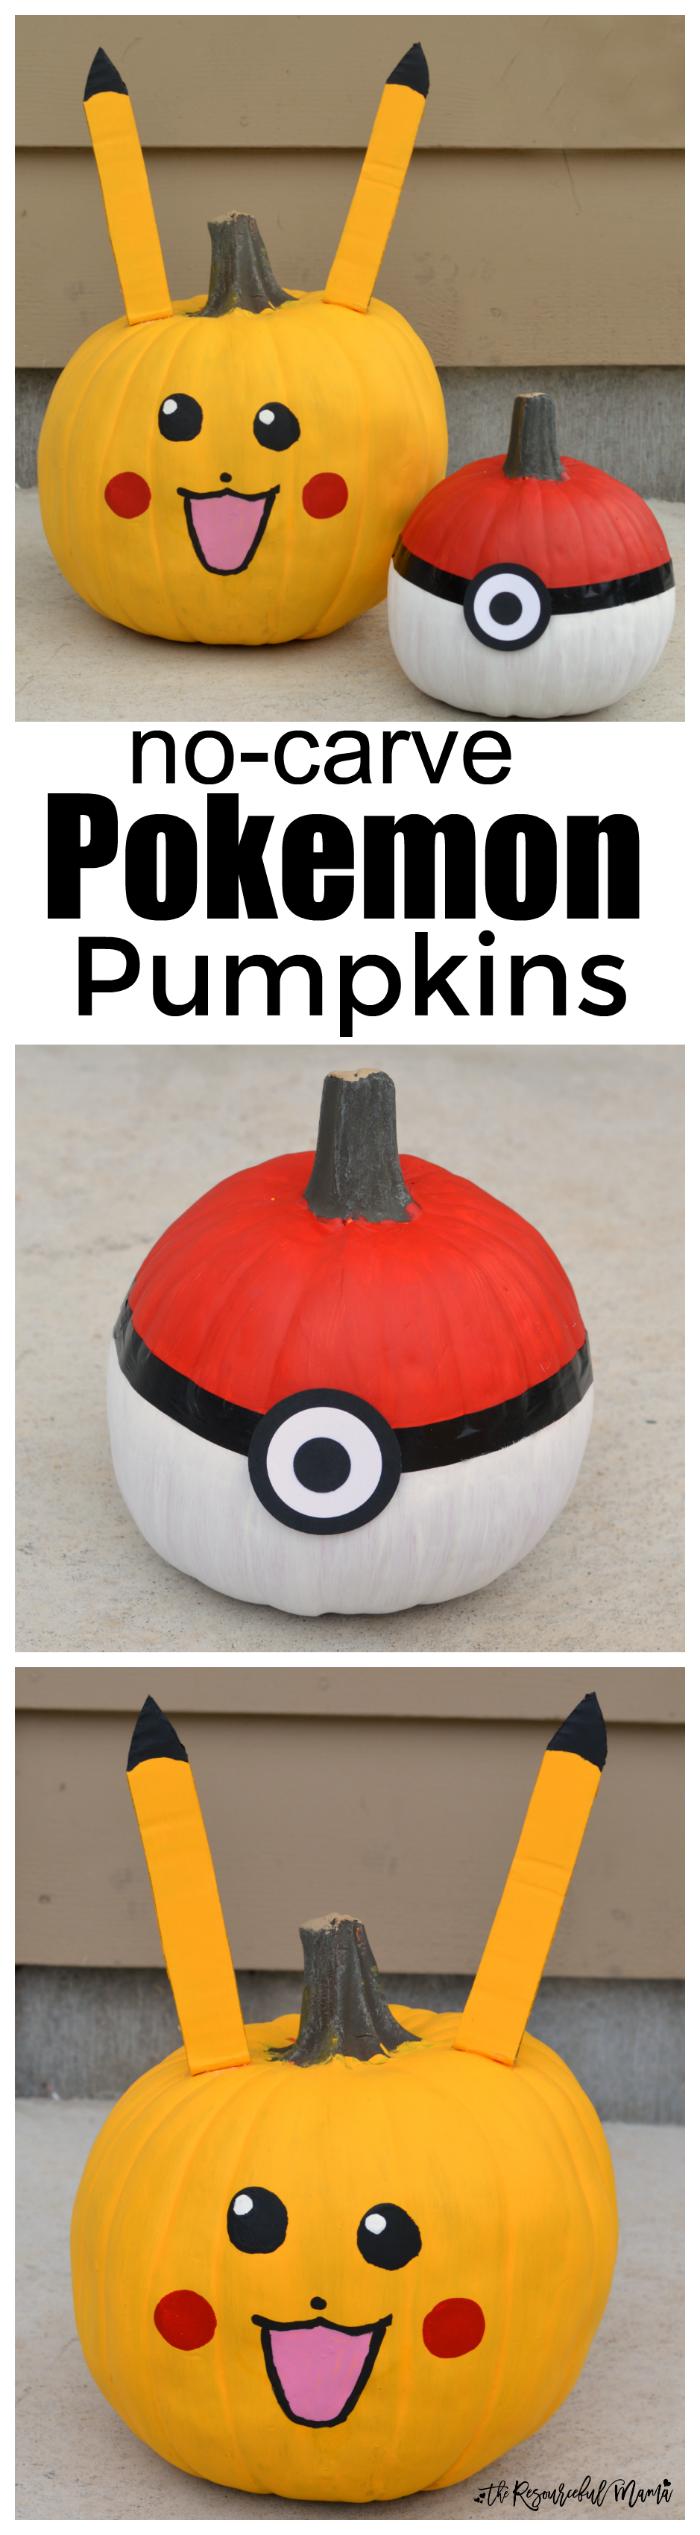 No-carve Poke Ball and Pikachu Pokemon Pumpkins for Halloween.